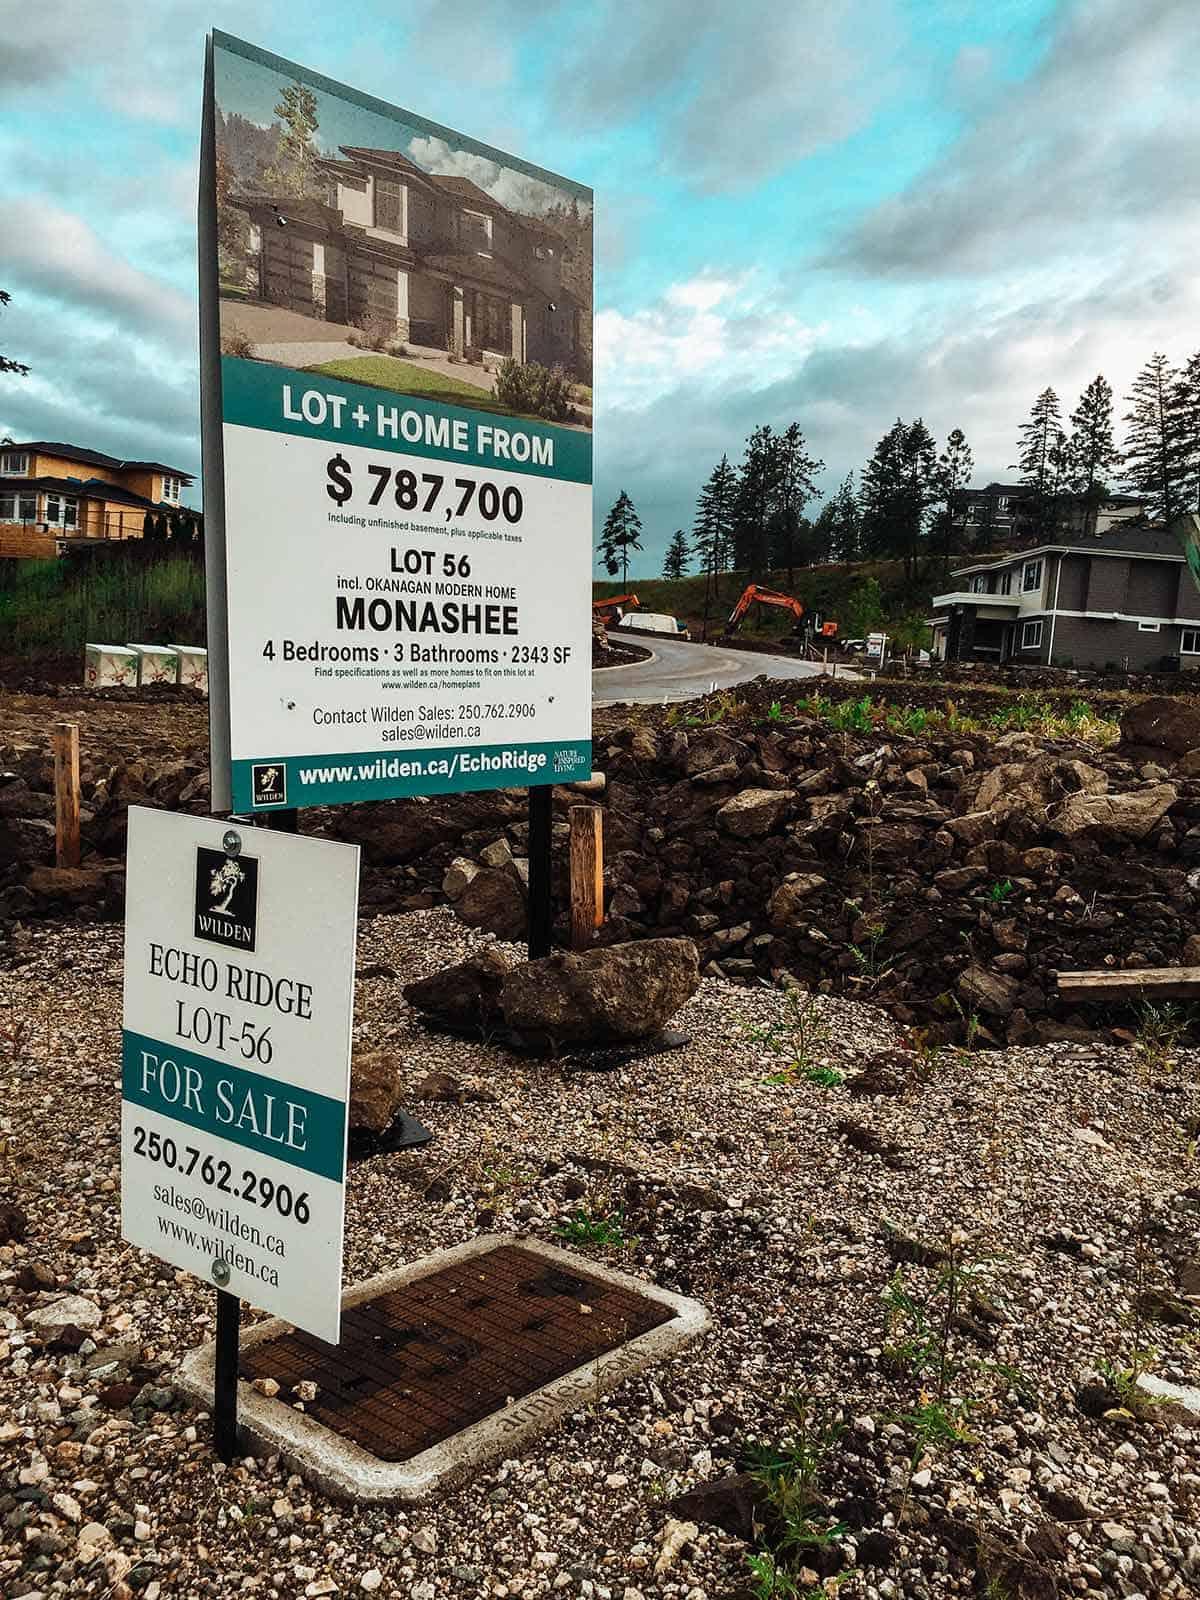 Echo Ridge Lot + Home Package Monashee Home Plan image